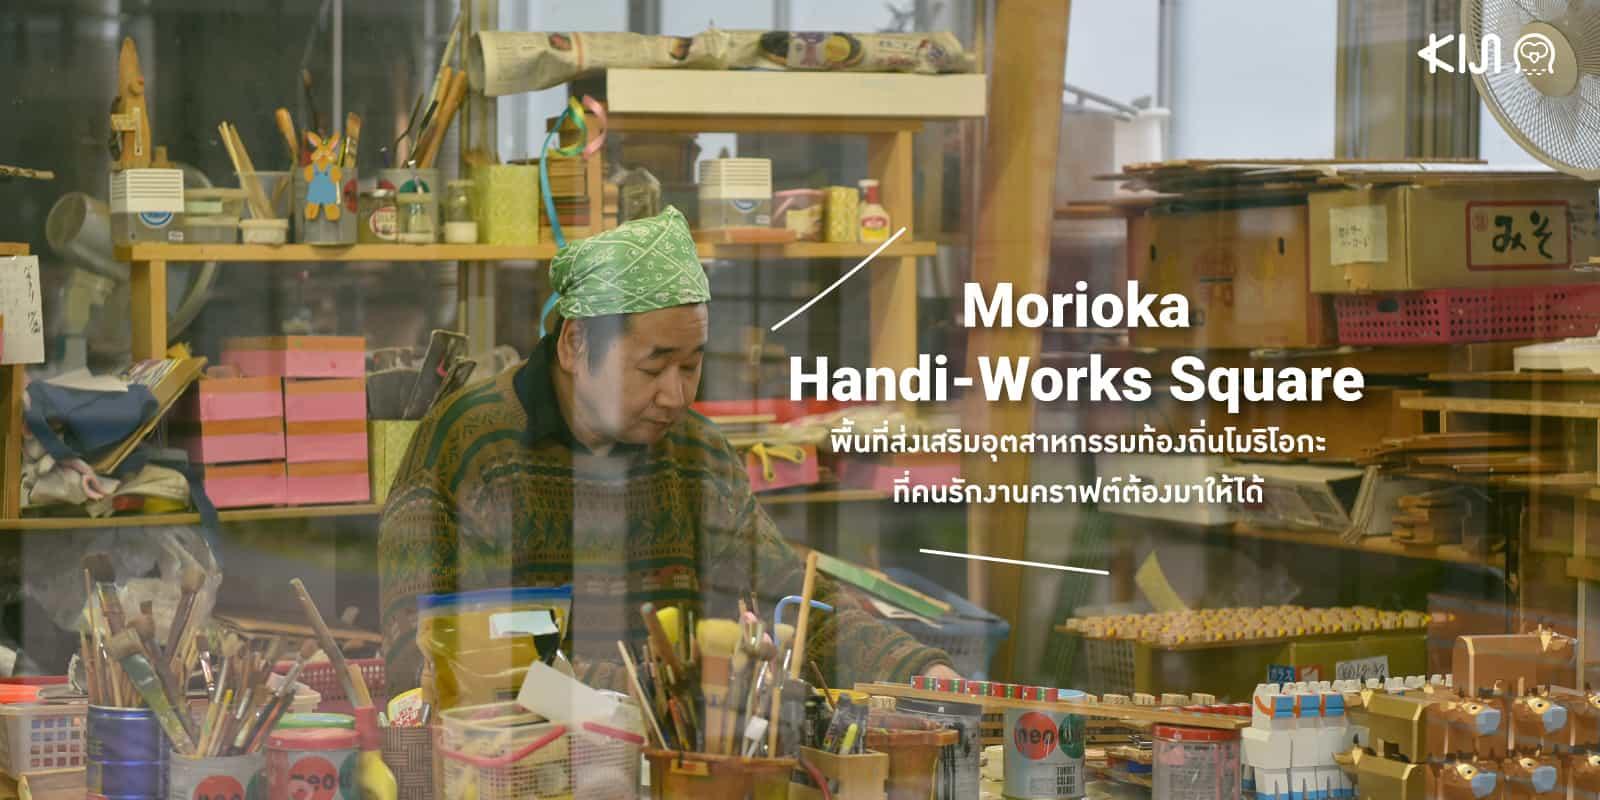 Morioka Handi-Works Square